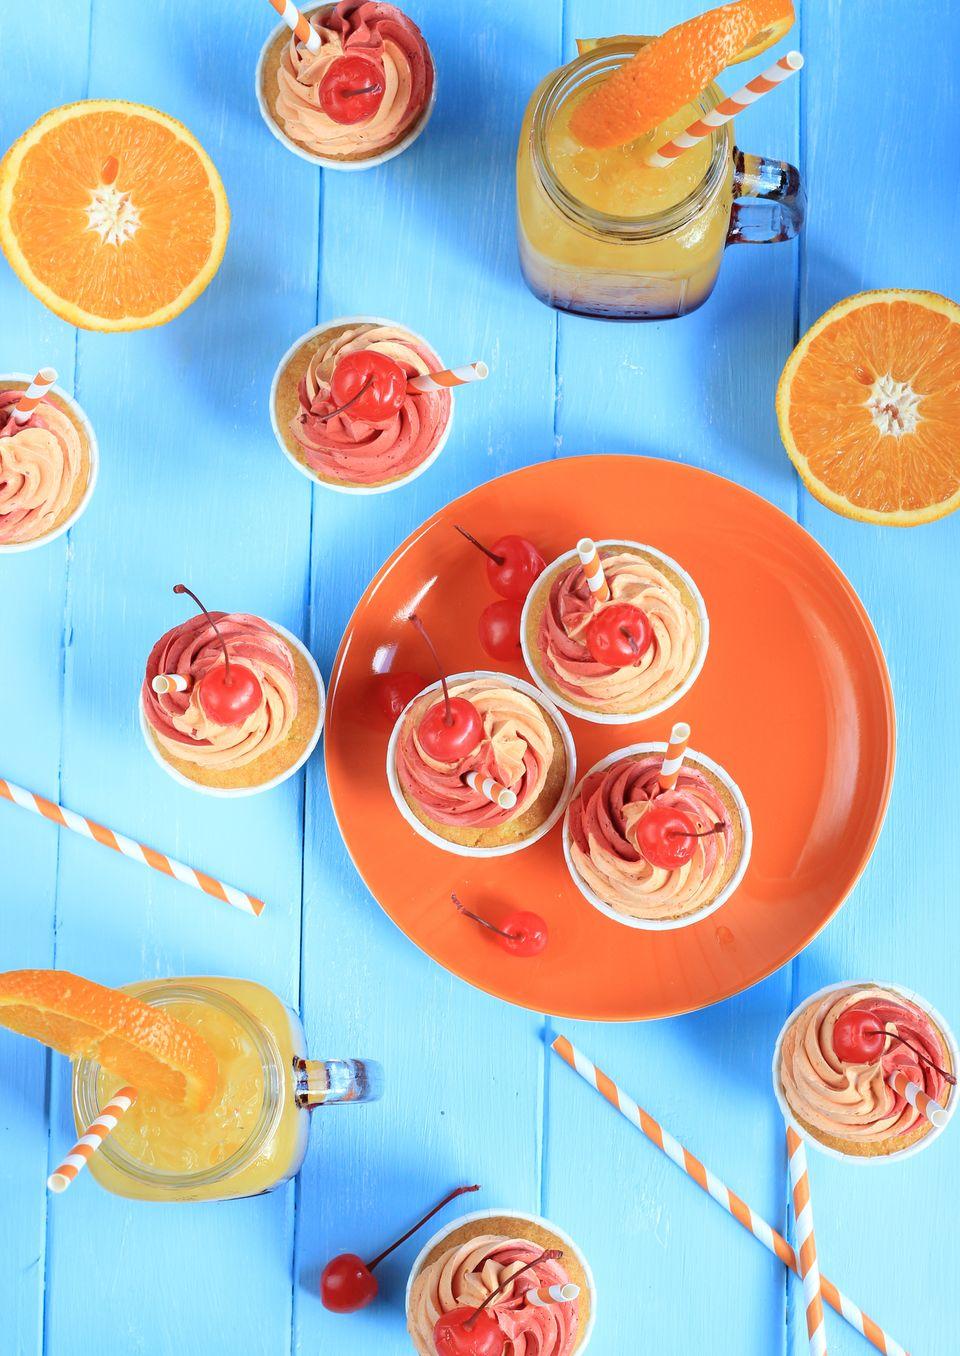 Tequila Sunrise Cupcake - inspiriert vom Sommer!